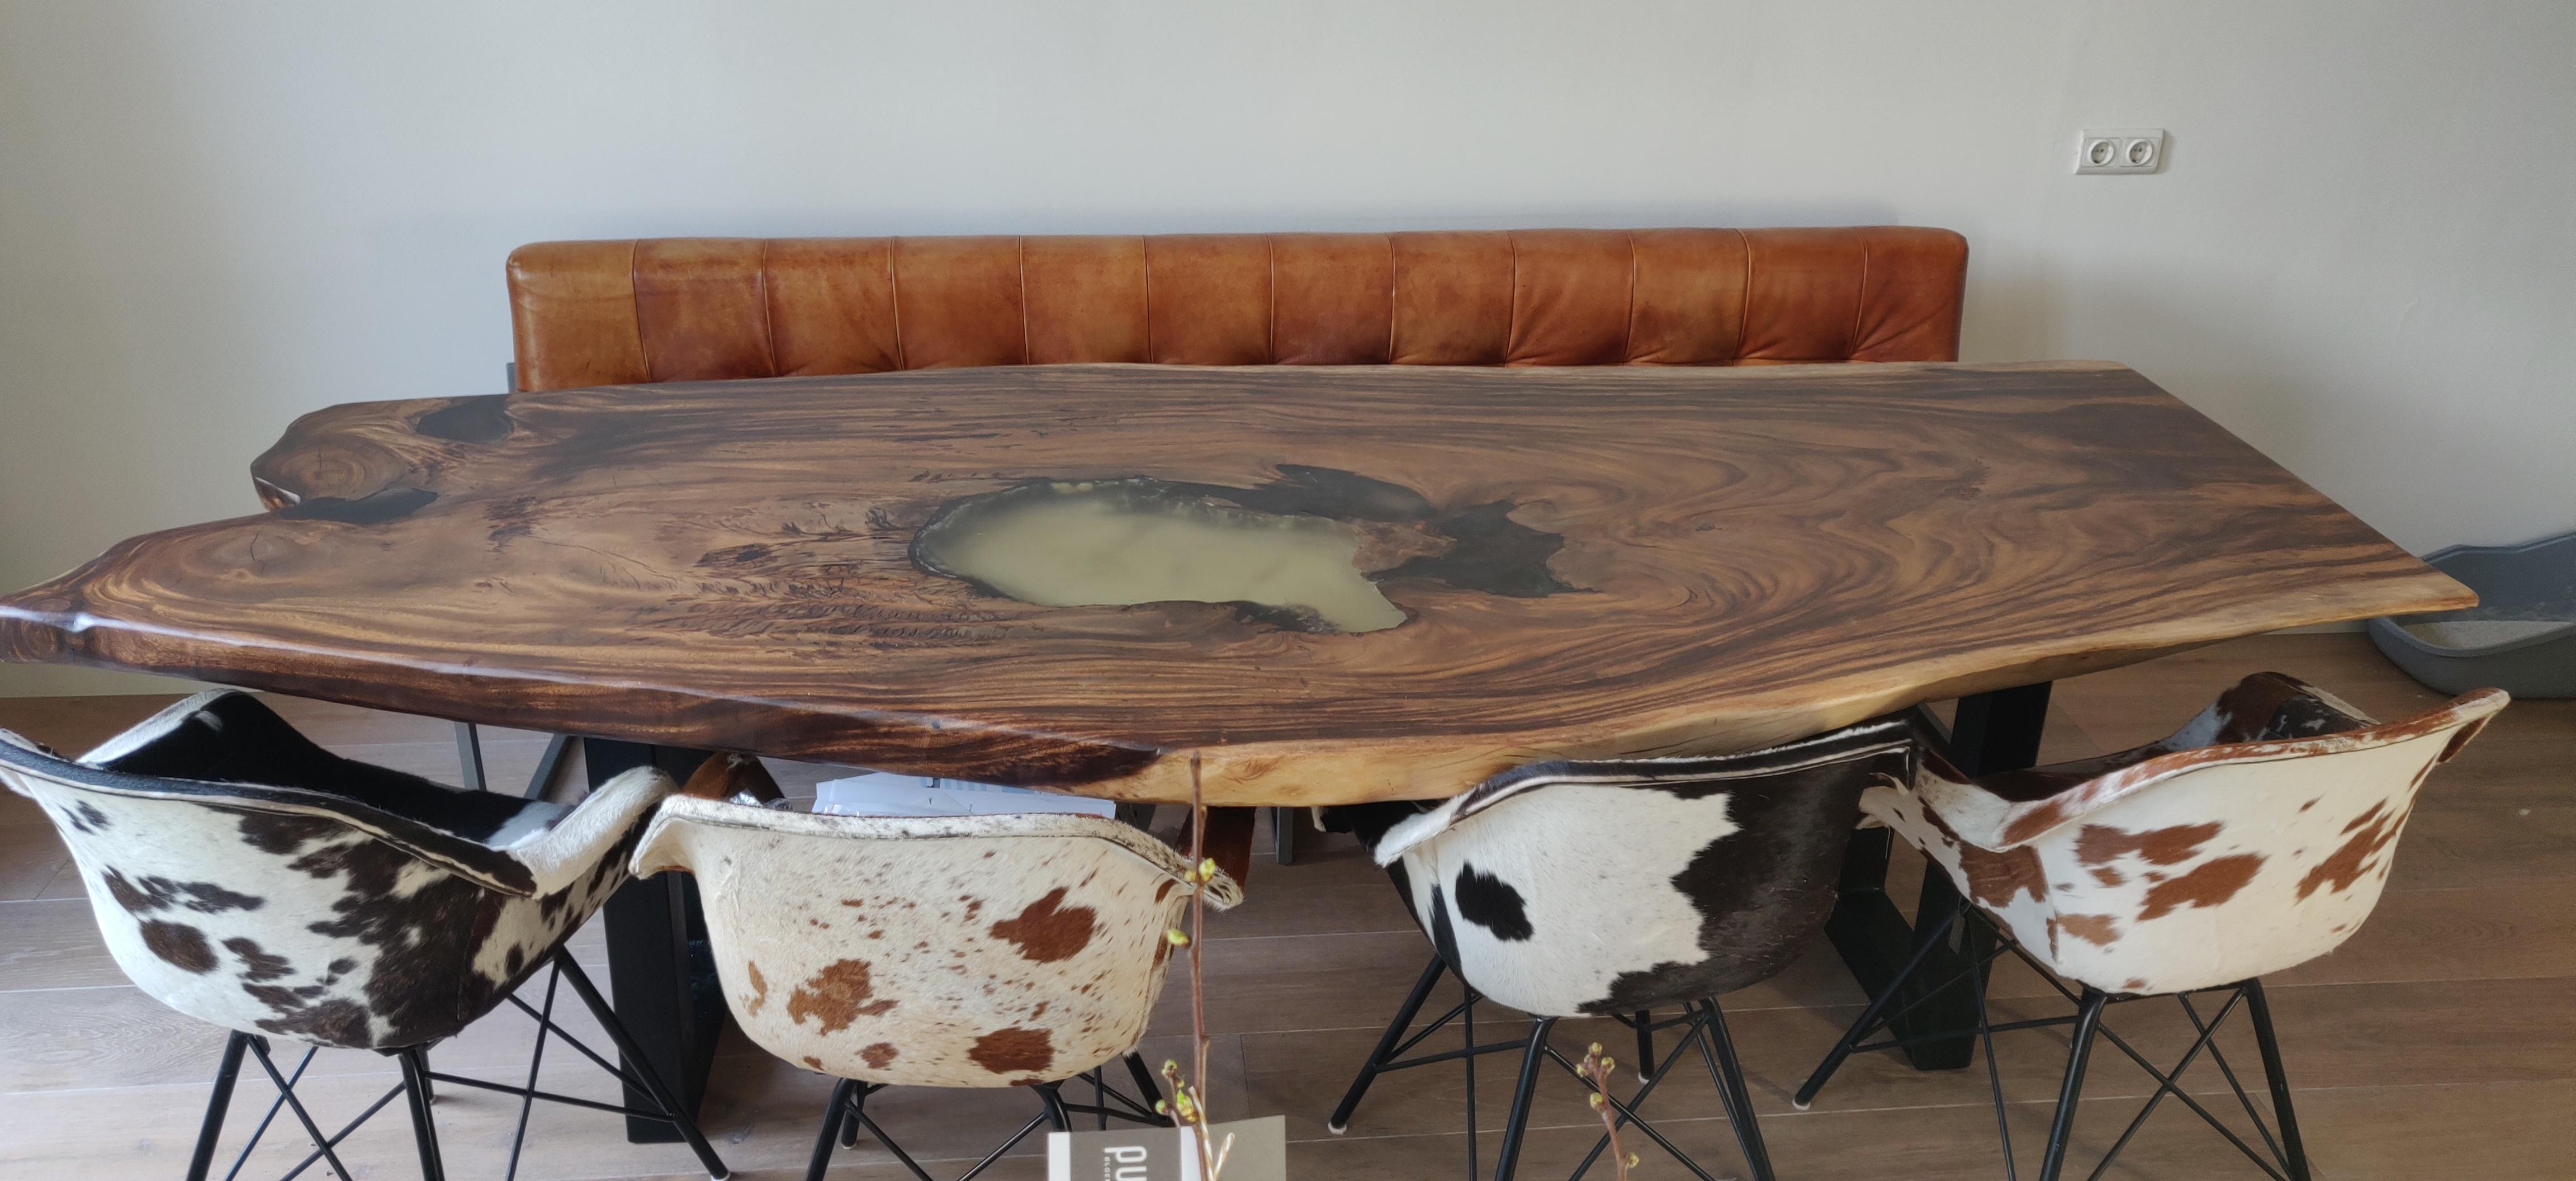 Suar boomstam tafel epoxy | Woodindustries